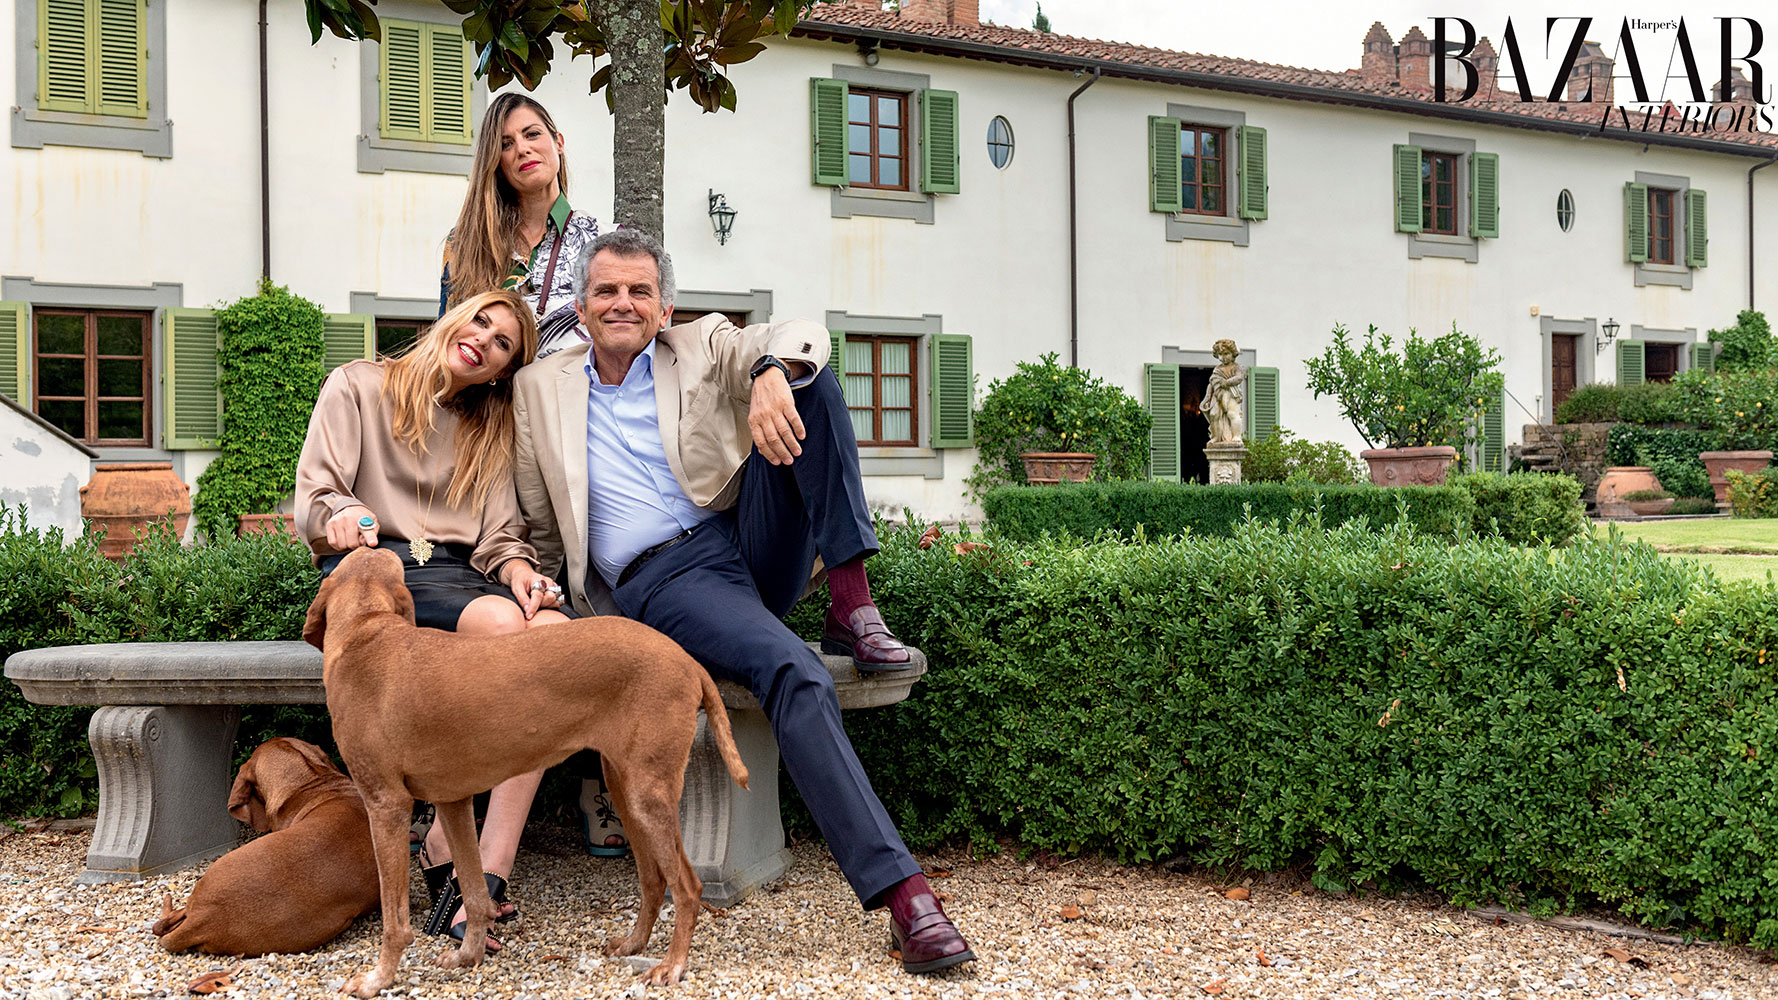 Ông Ferruccio Ferragamo ở villa Il Borro cùng hai con gái Vivia (đang ngồi) và Vittoria (đang đứng). Ảnh: Harper's Bazaar Arabia